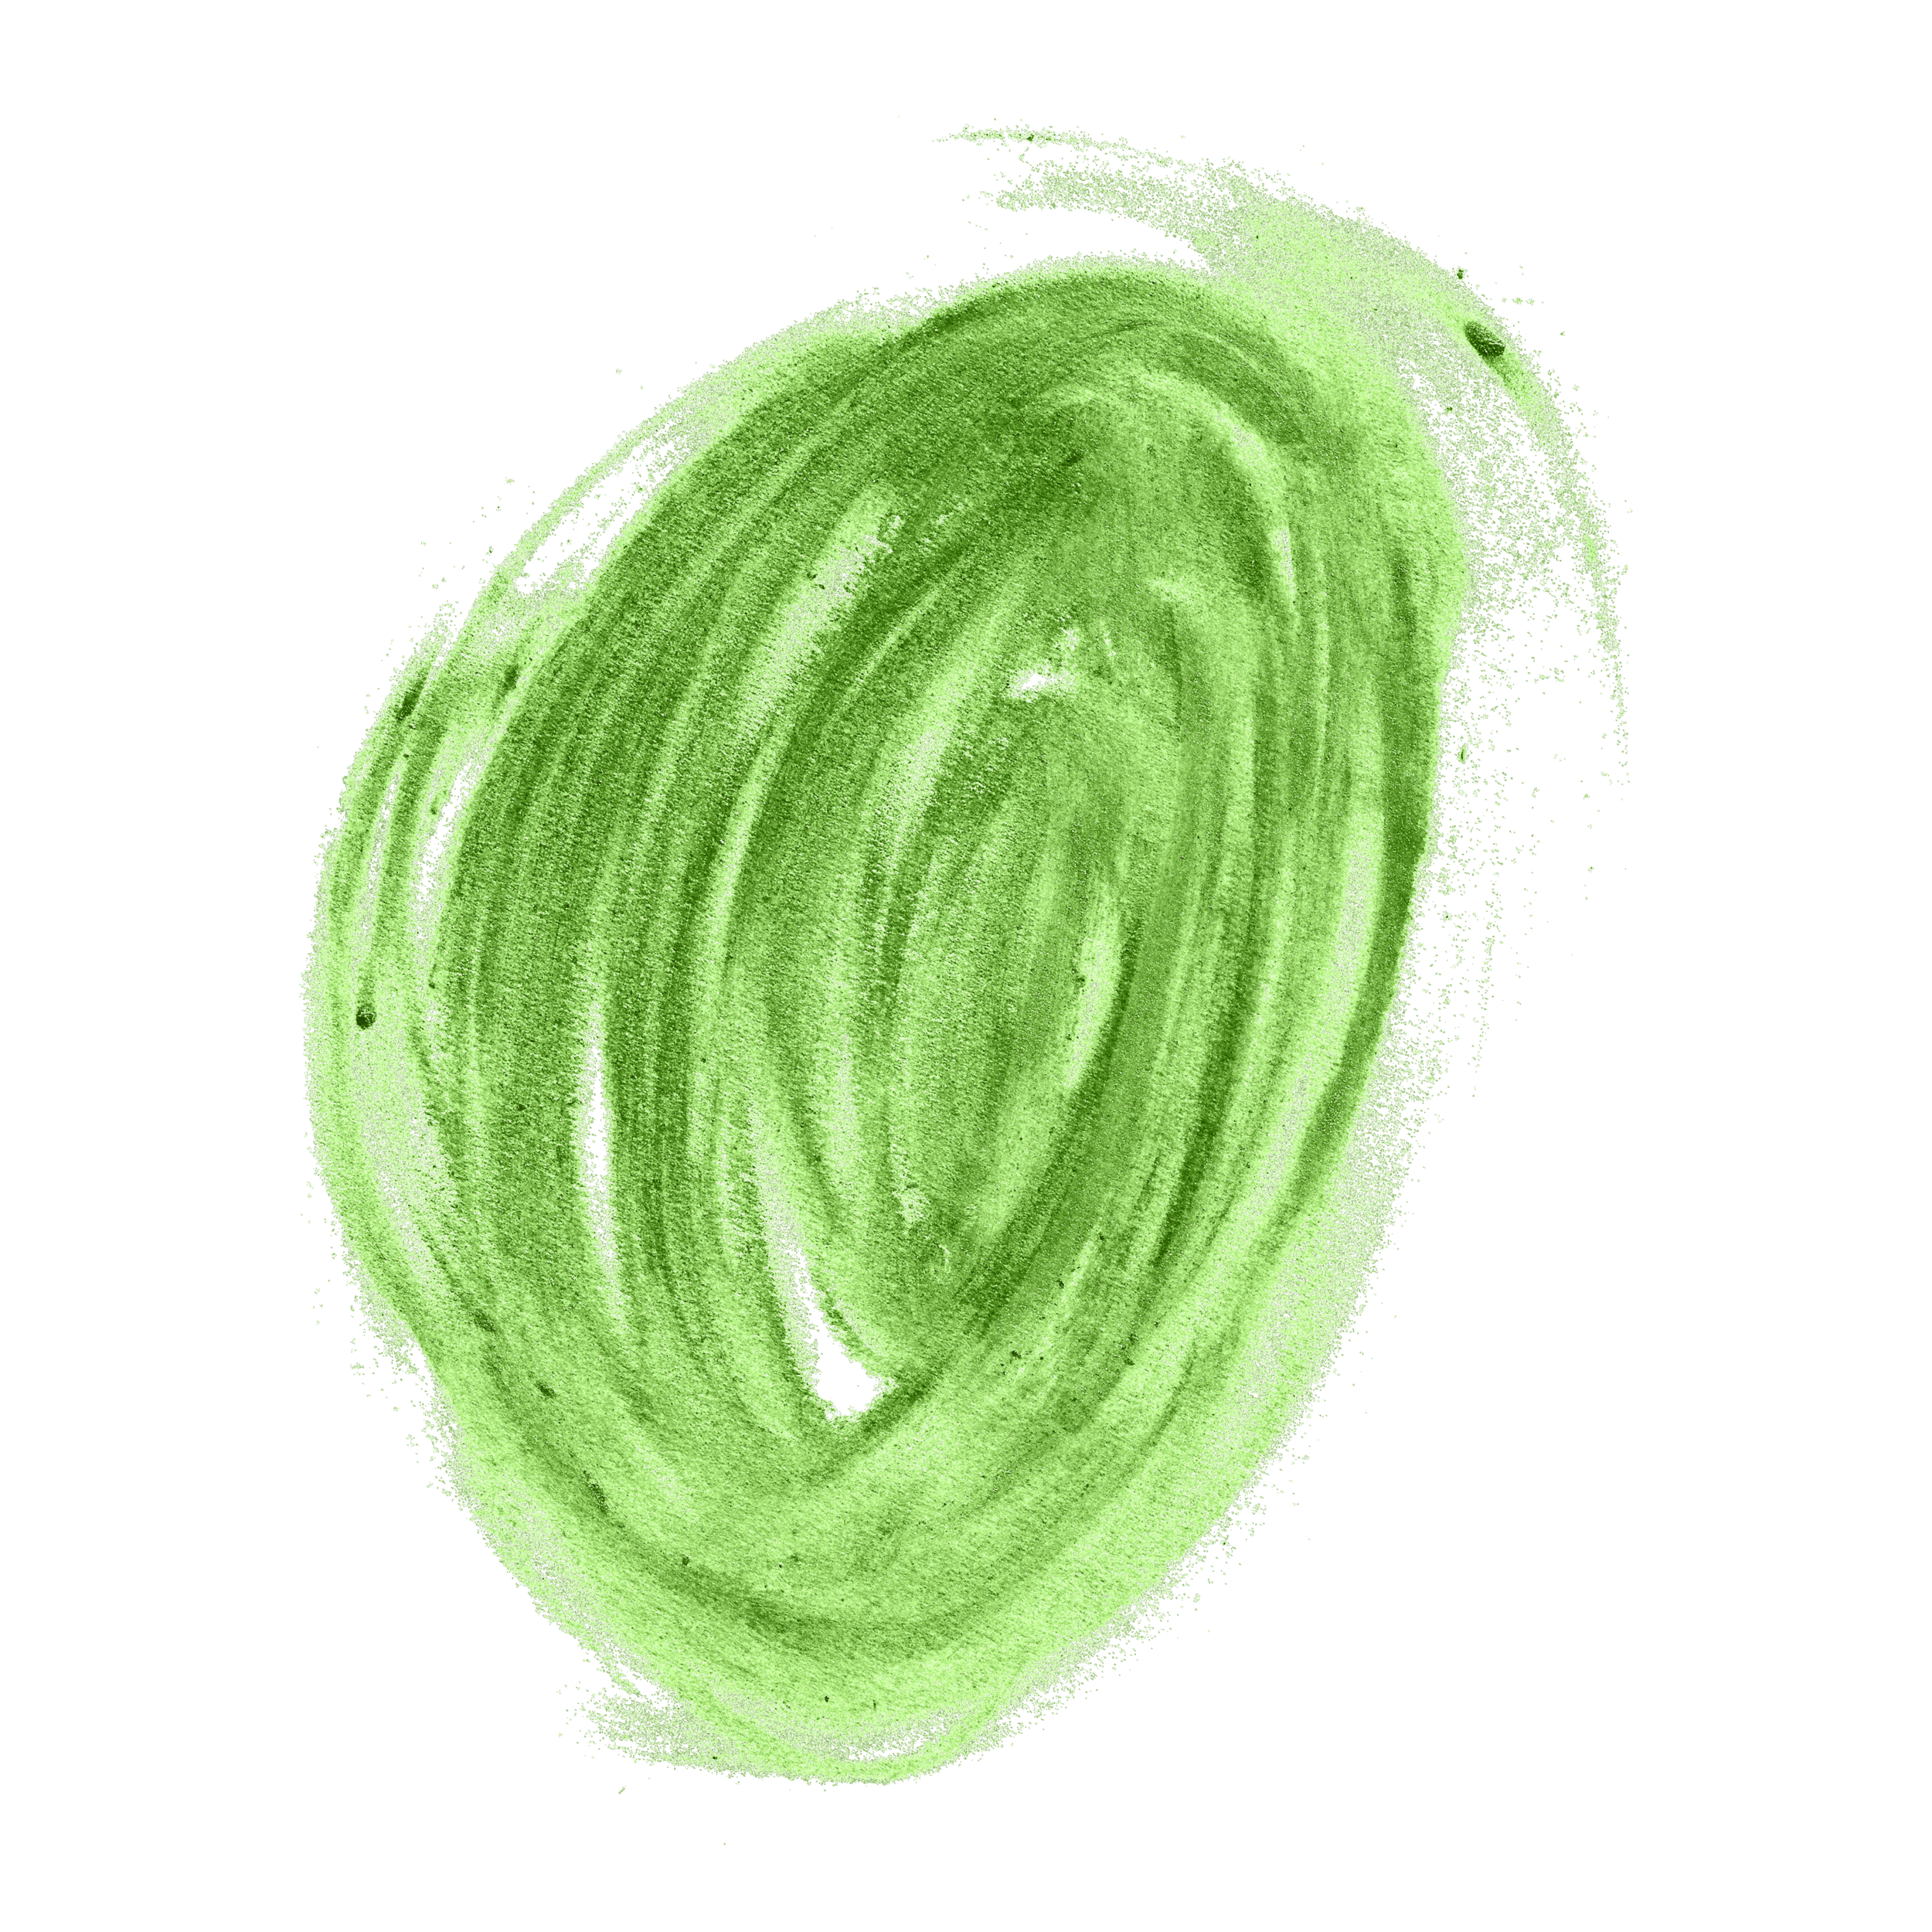 dot-avocado.png